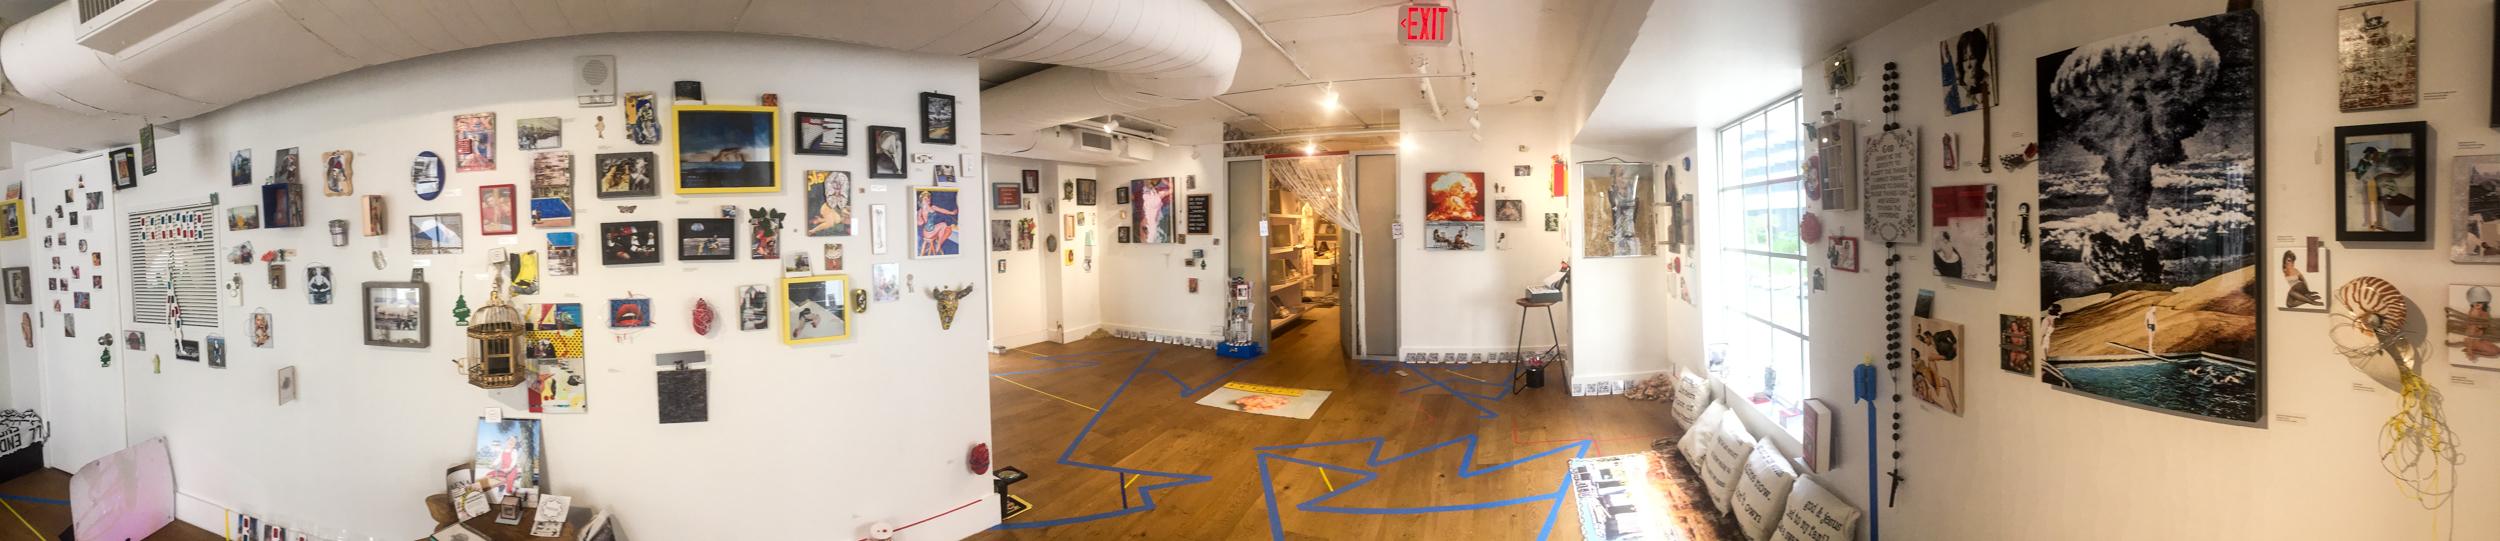 Faena-Exhibition-Images-3.jpg